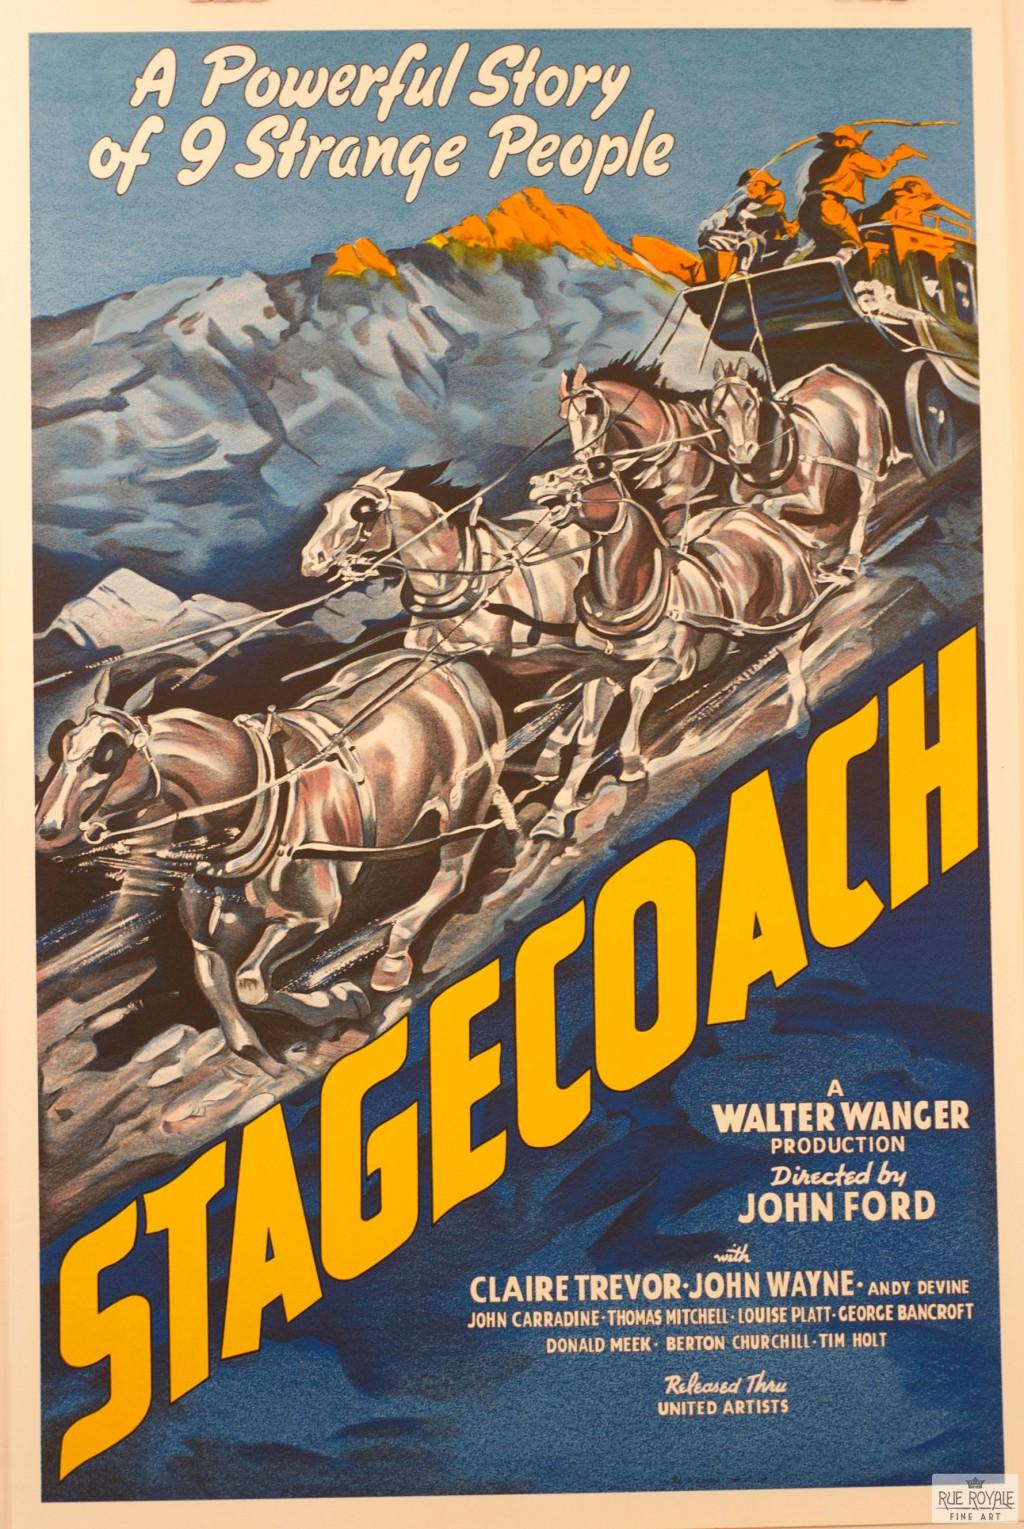 Stagecoach vintage movie poster fine art lithograph john ford classic movie poster vintage movie poster fine art lithograph one-sheet golden age of film